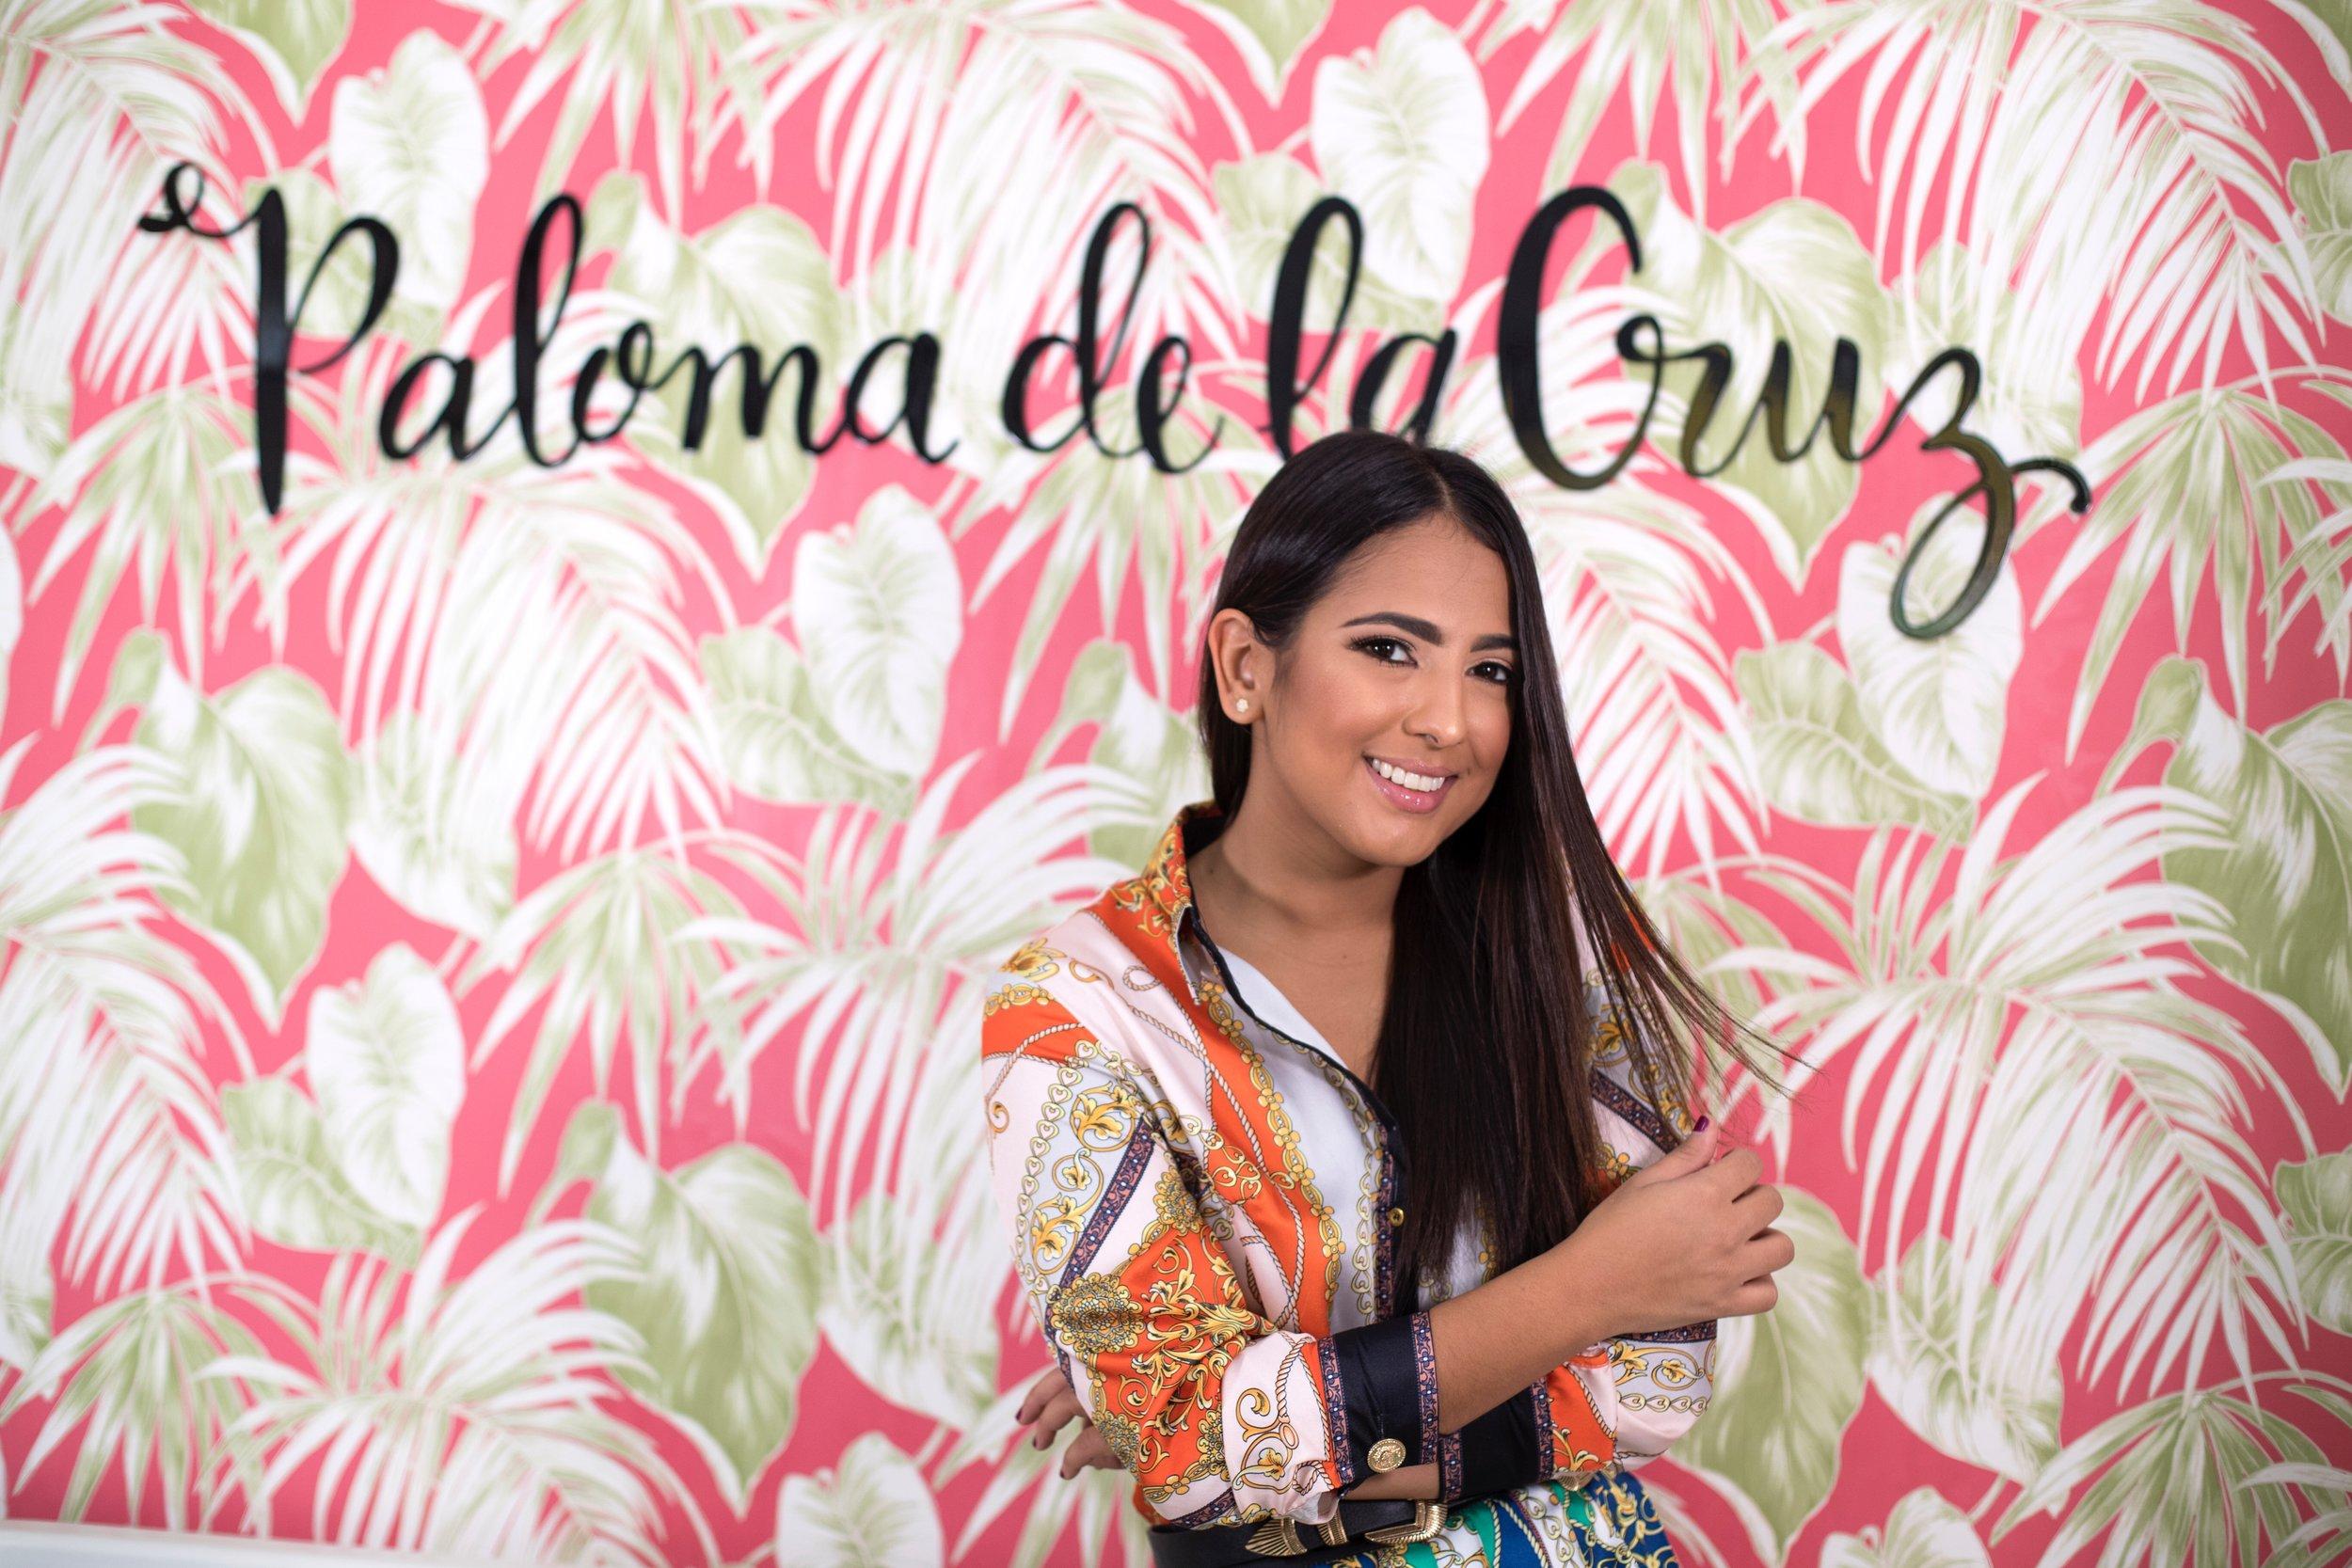 coach millennial Paloma De la cruz fashion travel blogger influencer